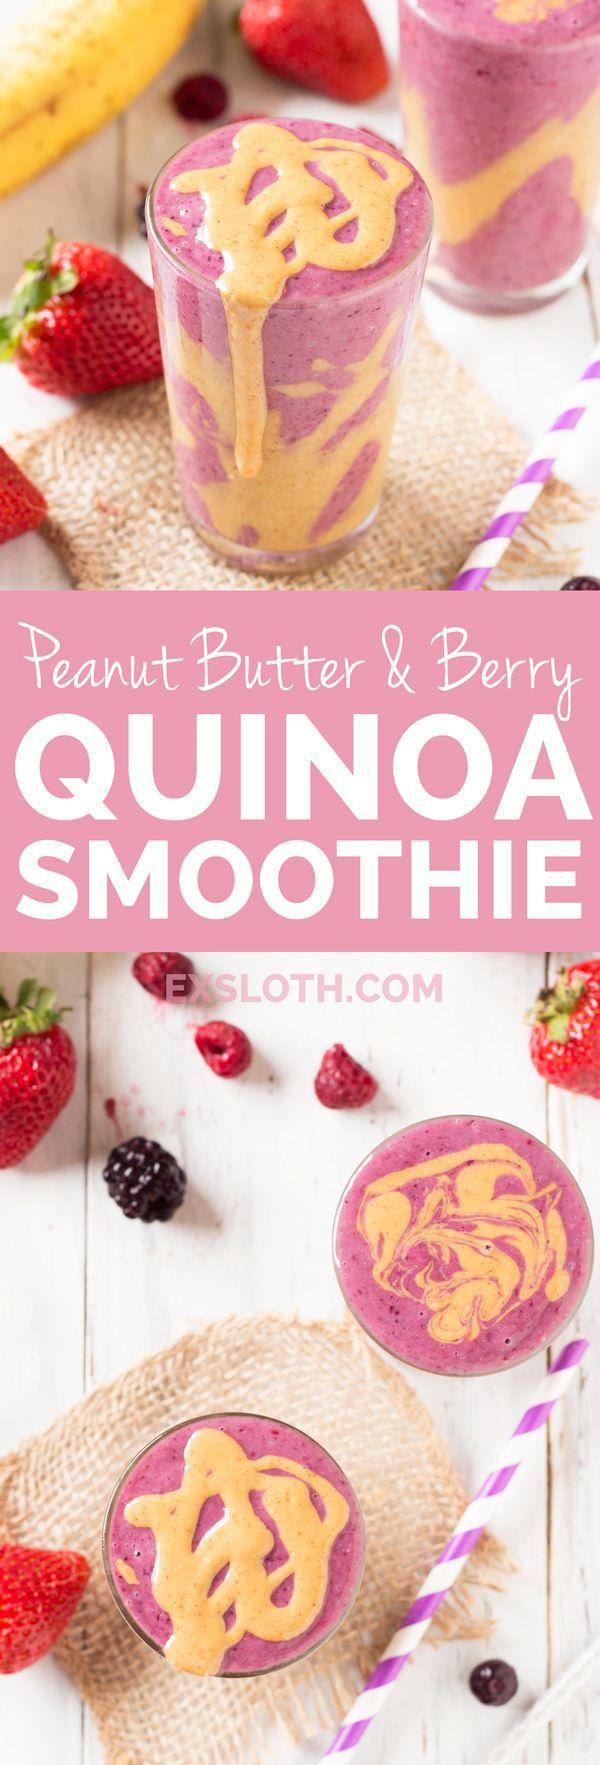 Peanut Butter & Berry Quinoa Smoothie